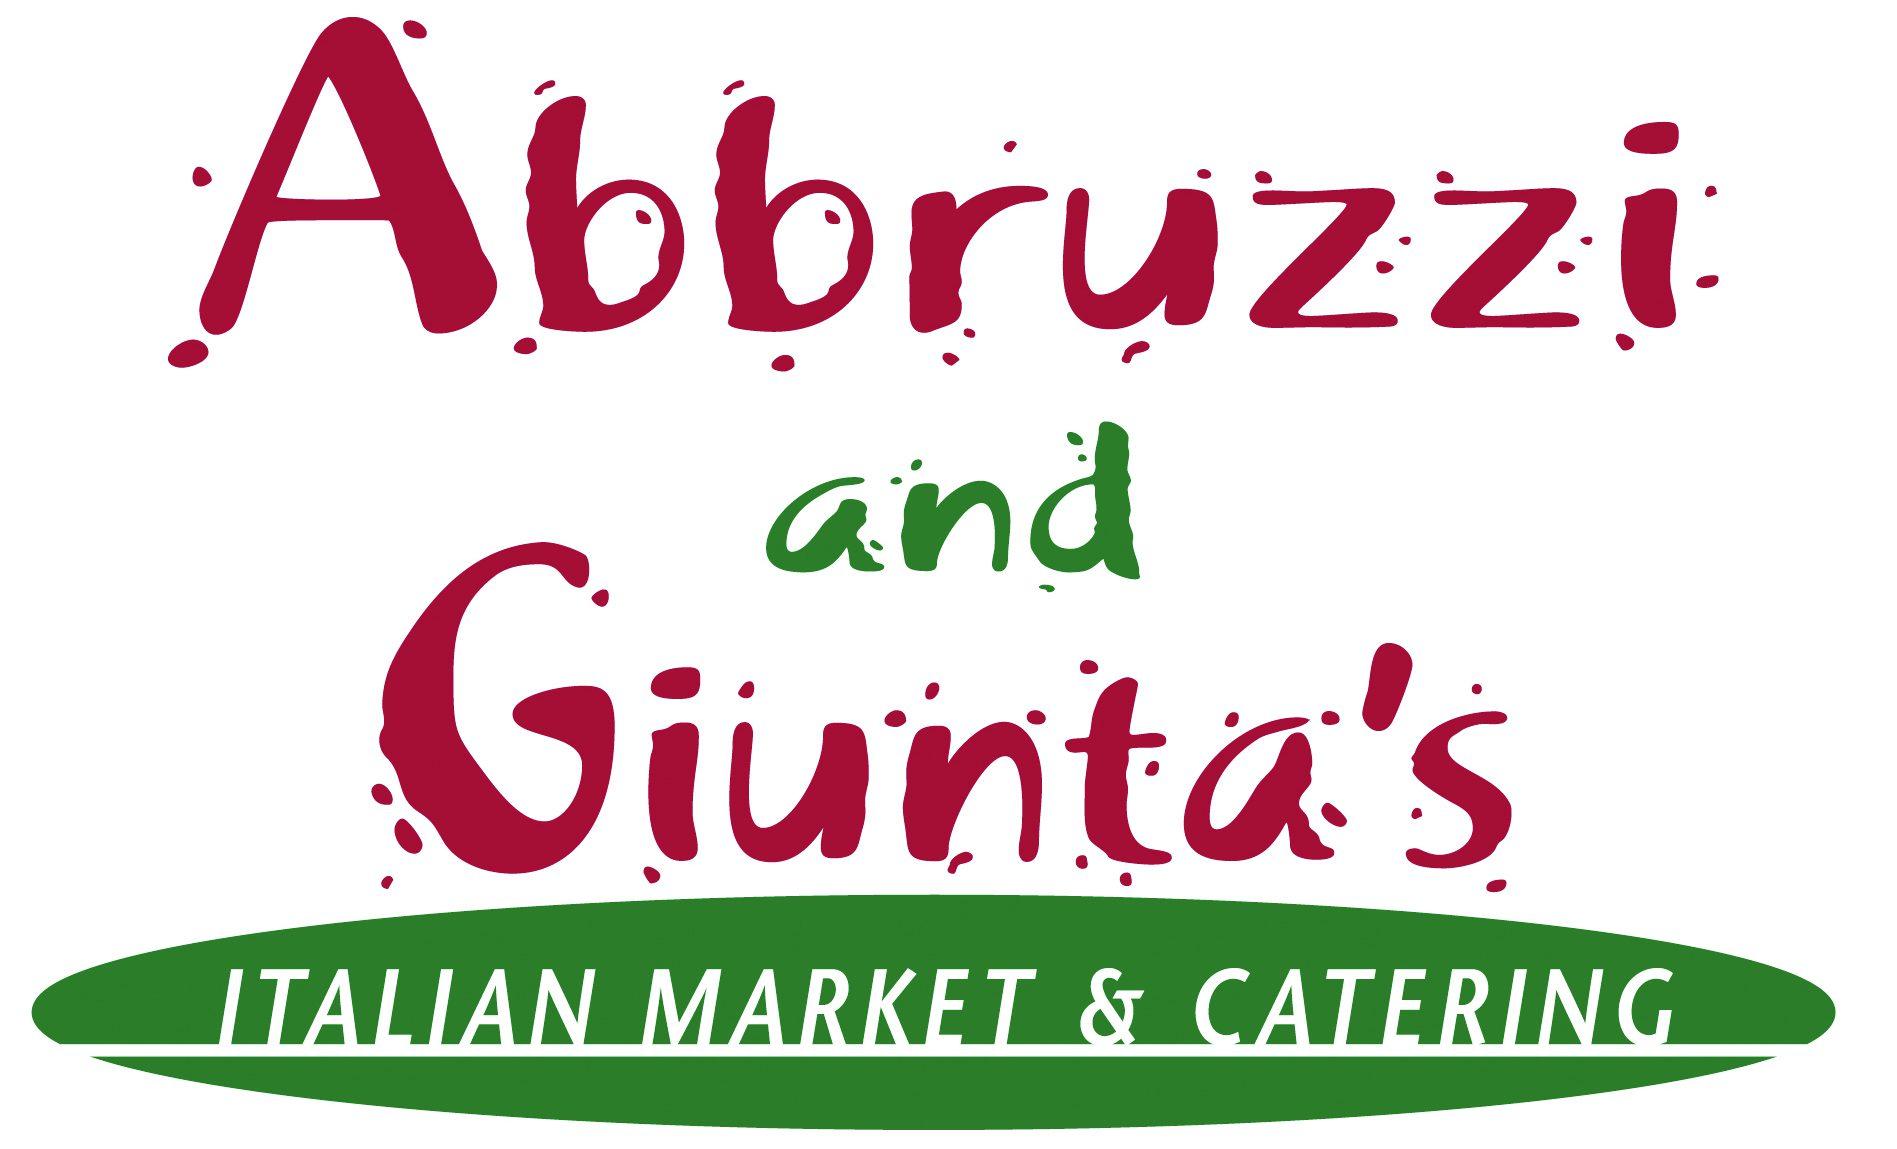 Abbruzzi & Giunta's | Italian Food Market and Homemade Food Catering